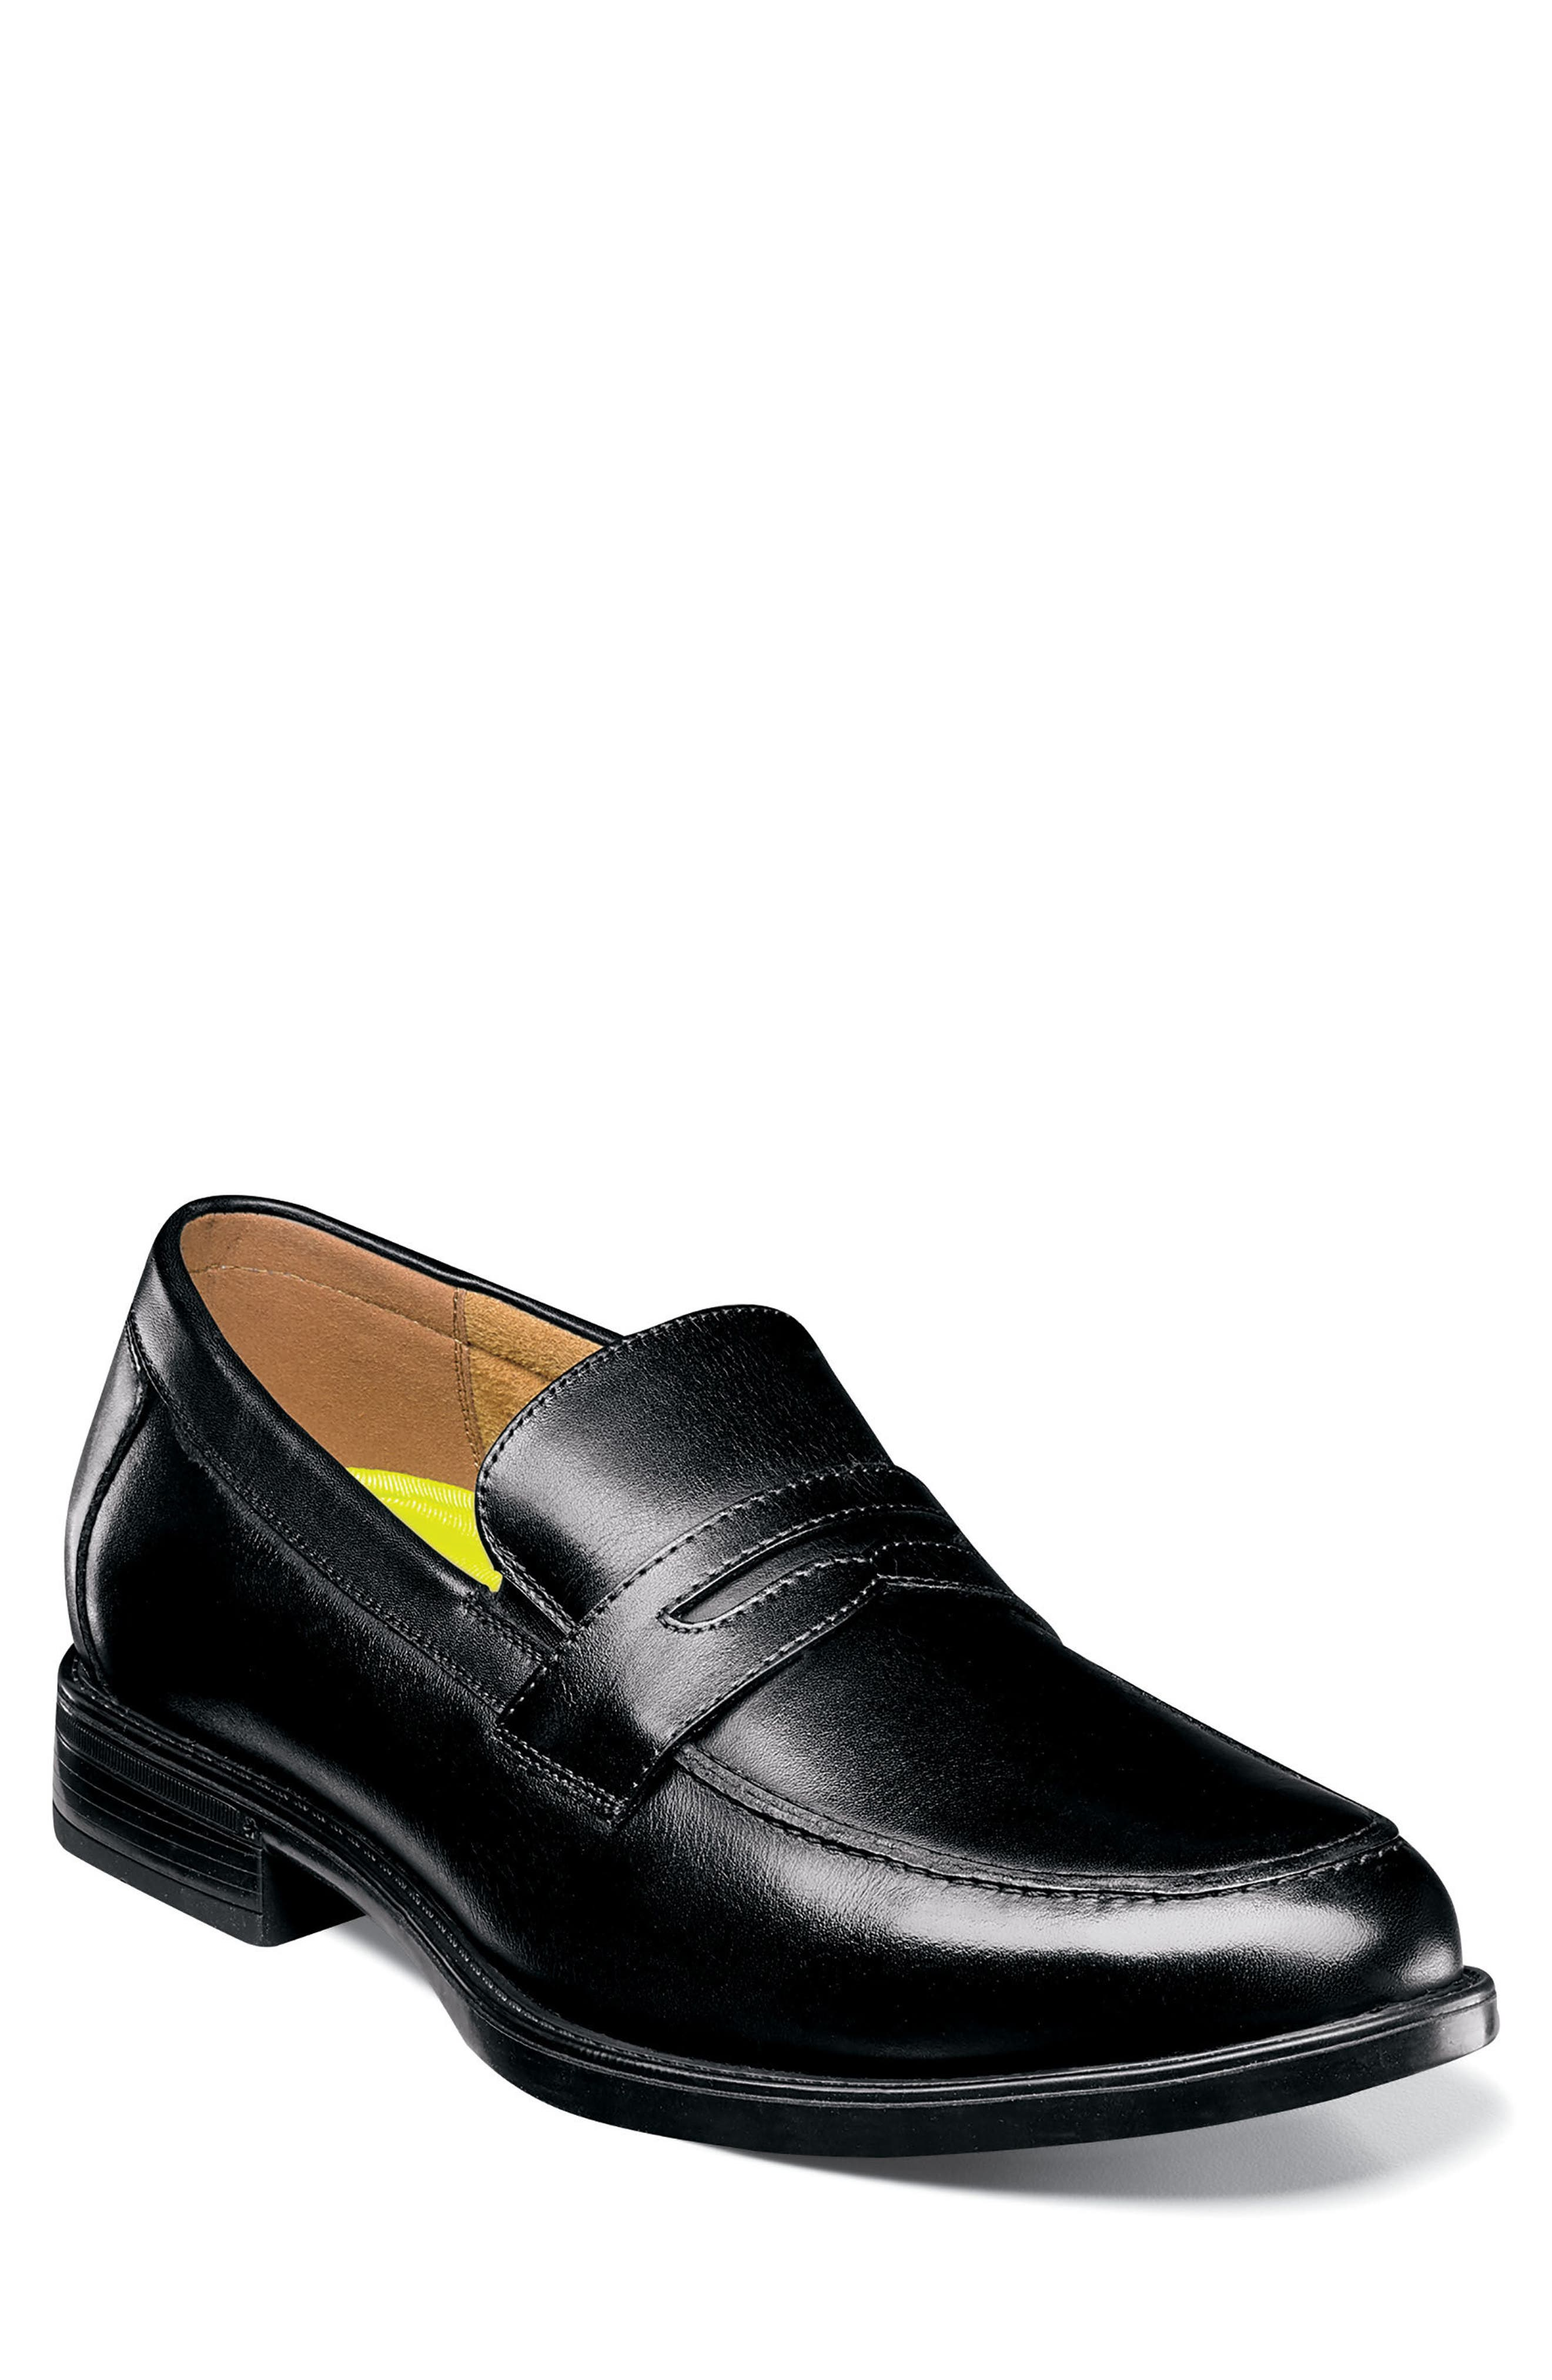 Midtown Penny Loafer,                         Main,                         color, Black